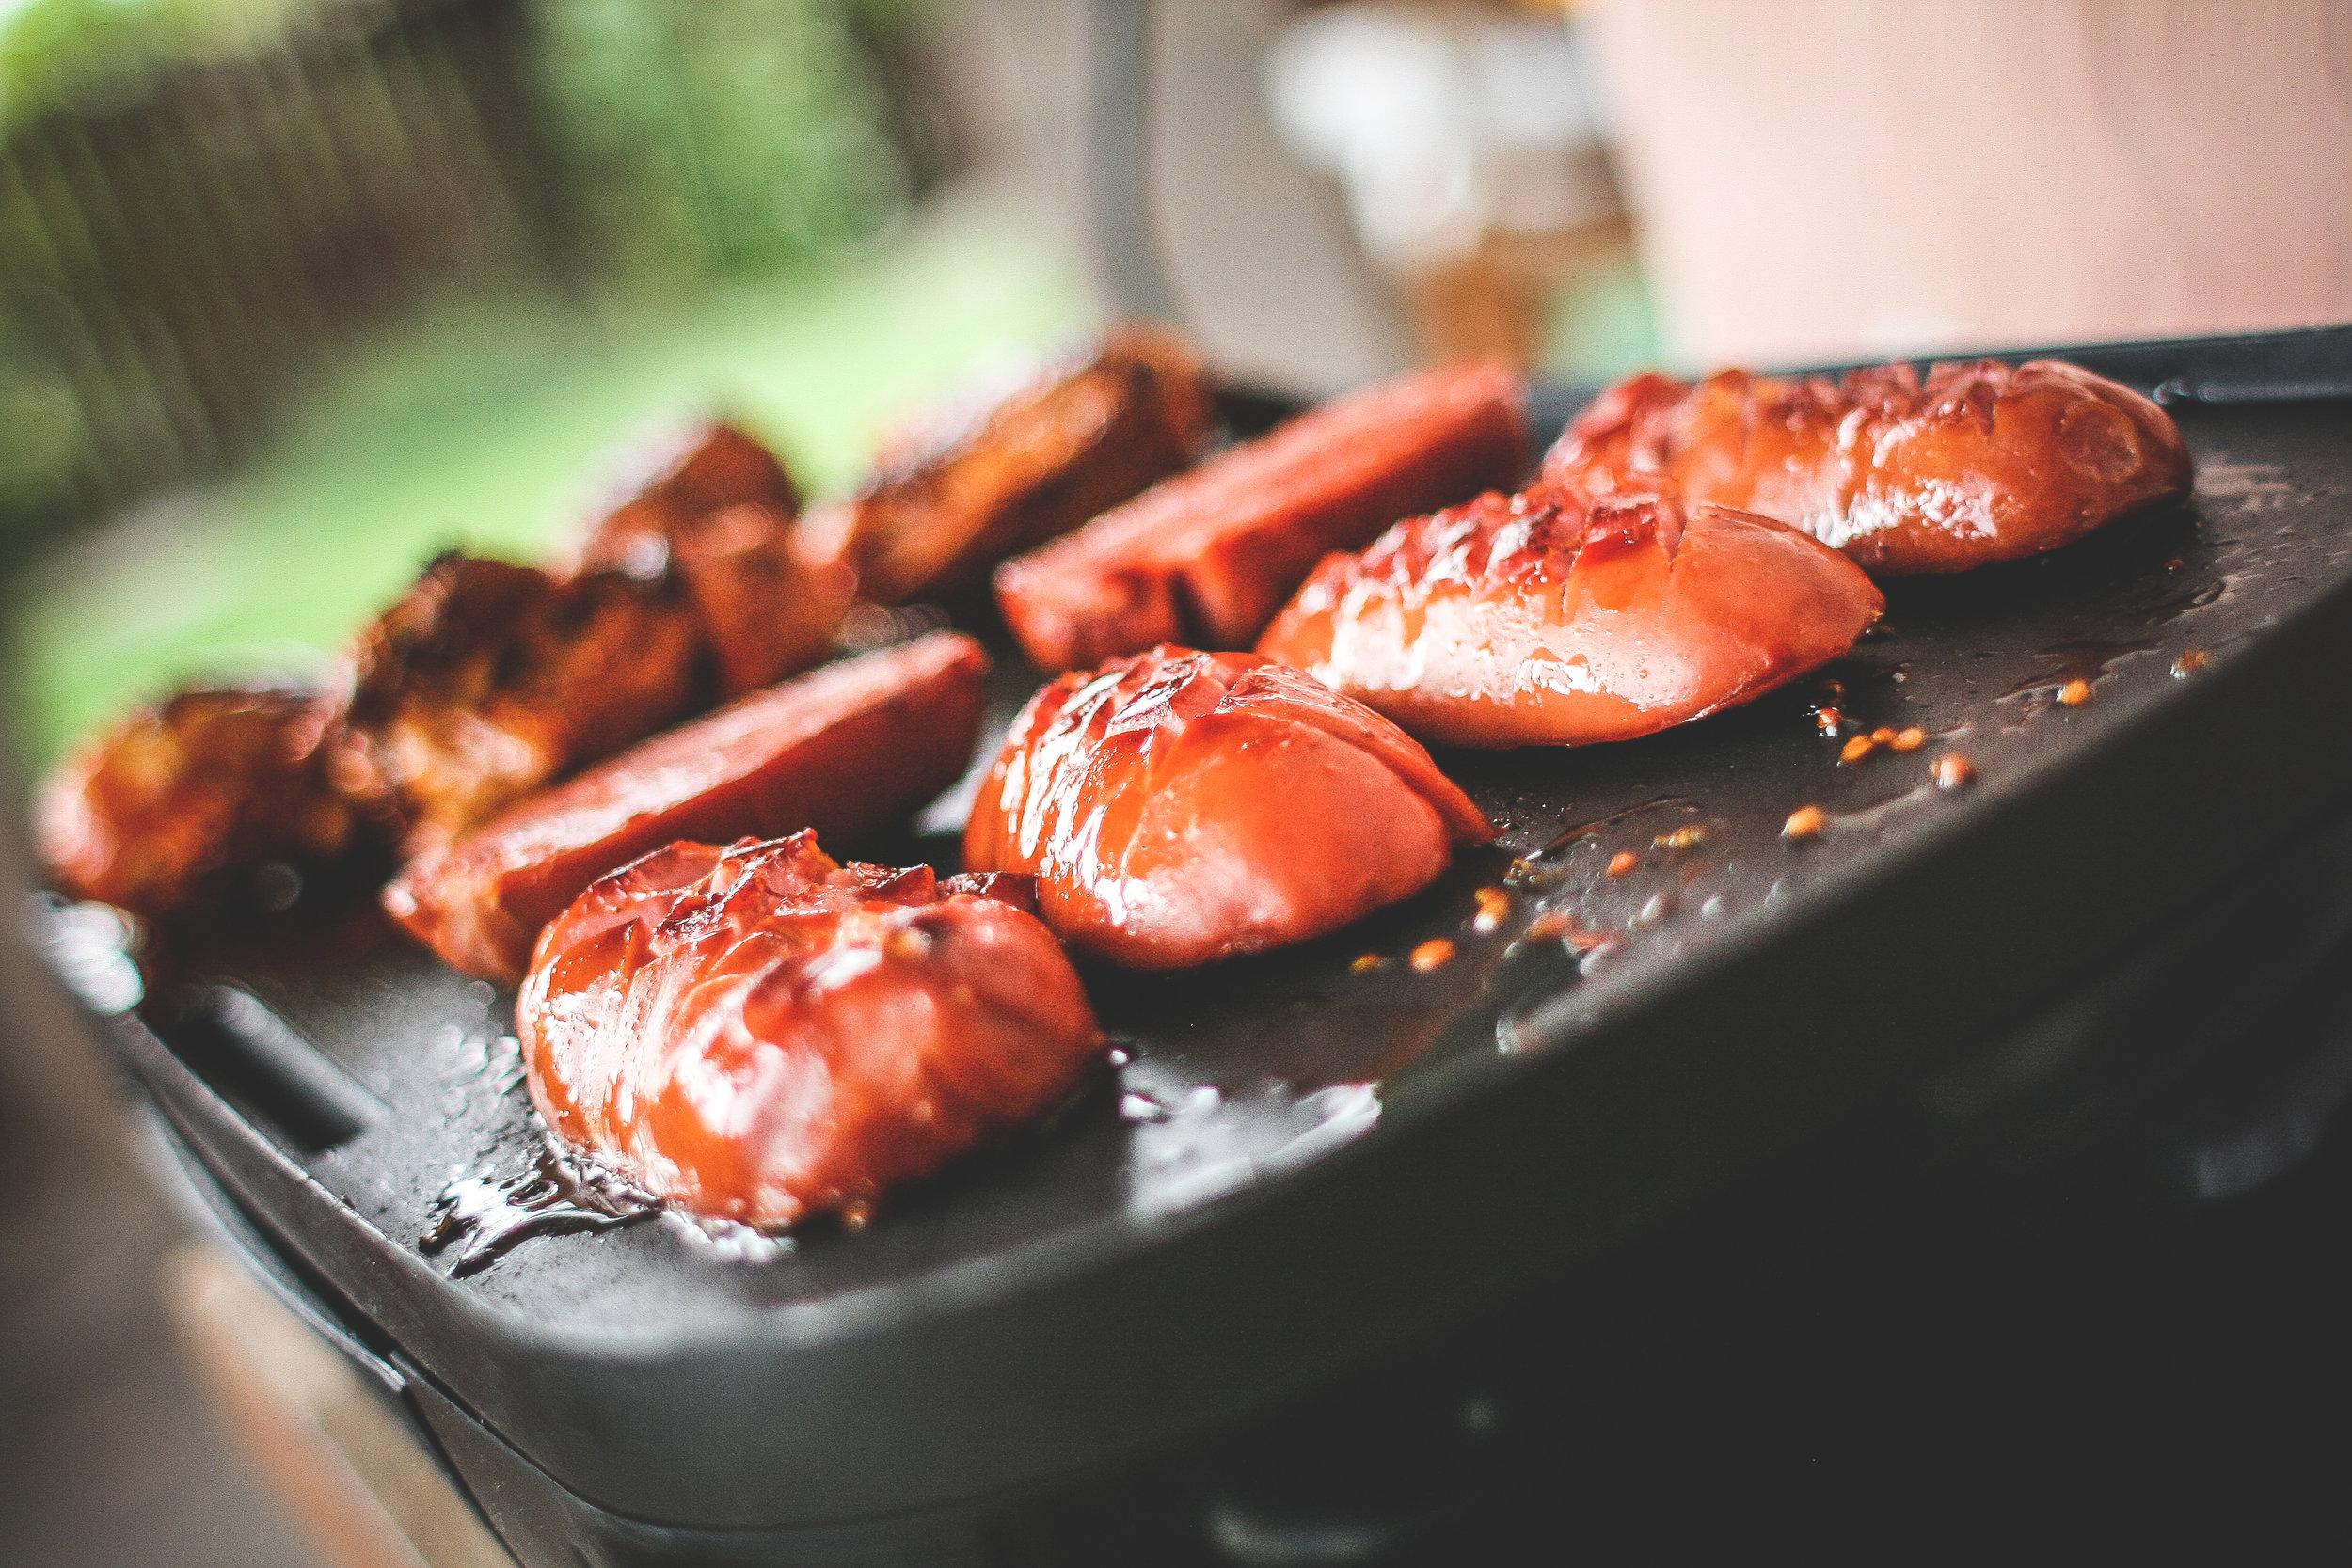 grill-bbq-party-2-picjumbo-com.jpg